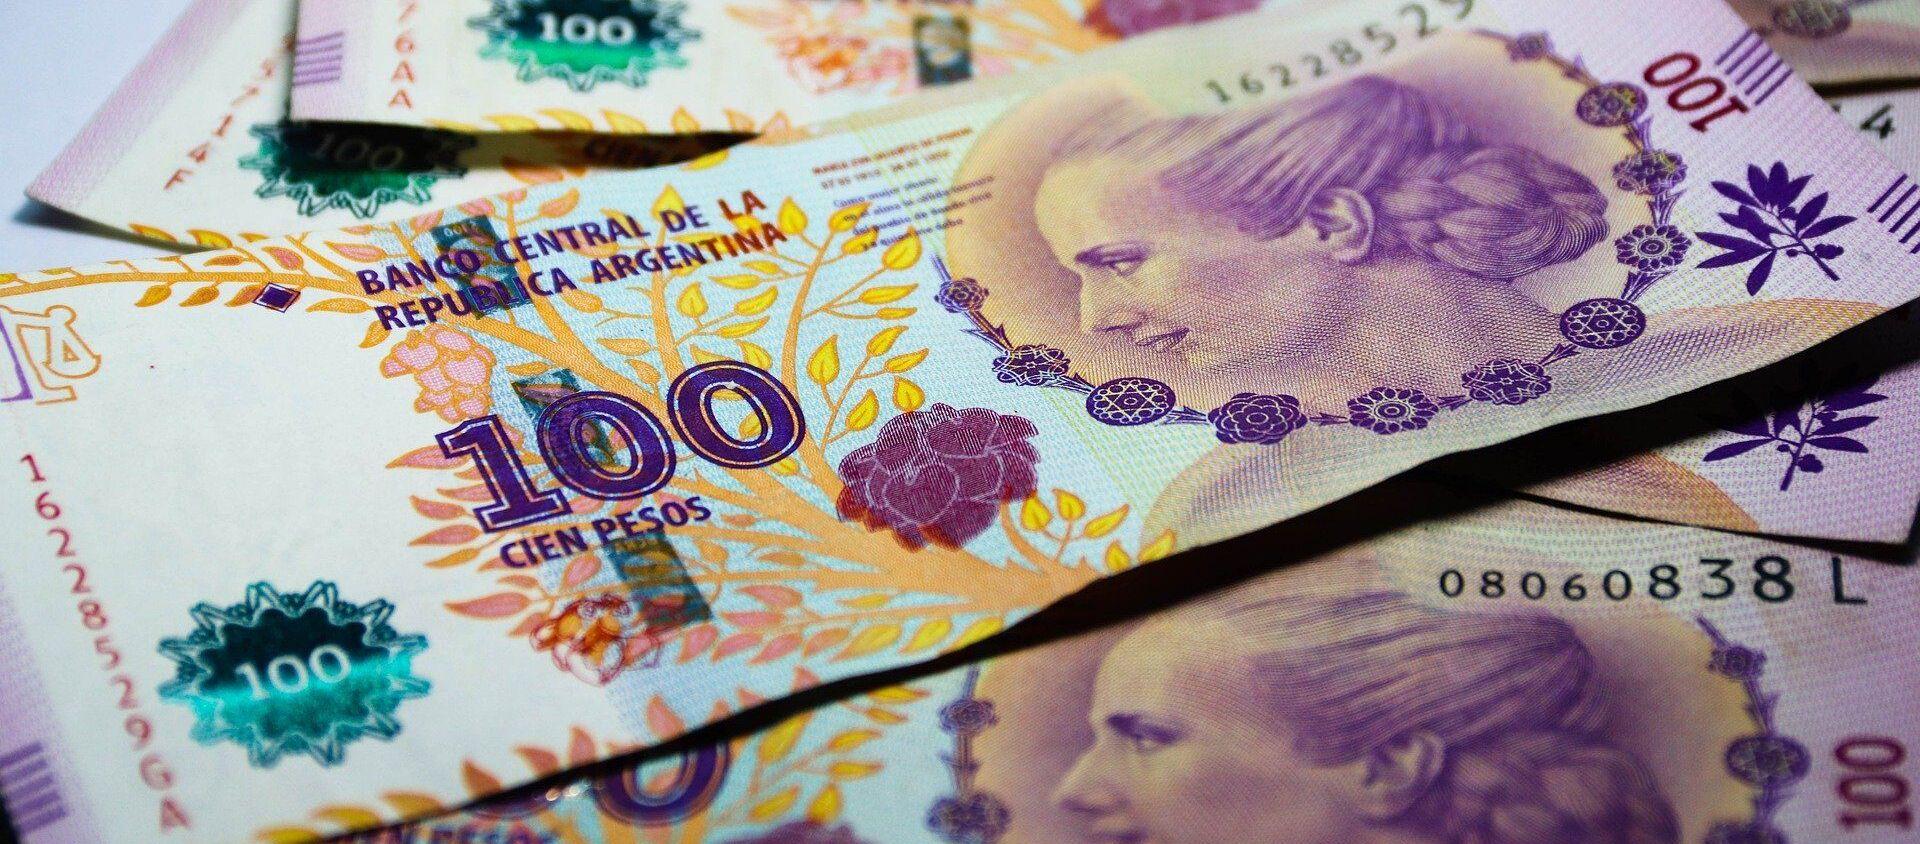 Billetes de cien pesos argentinos - Sputnik Mundo, 1920, 05.01.2021